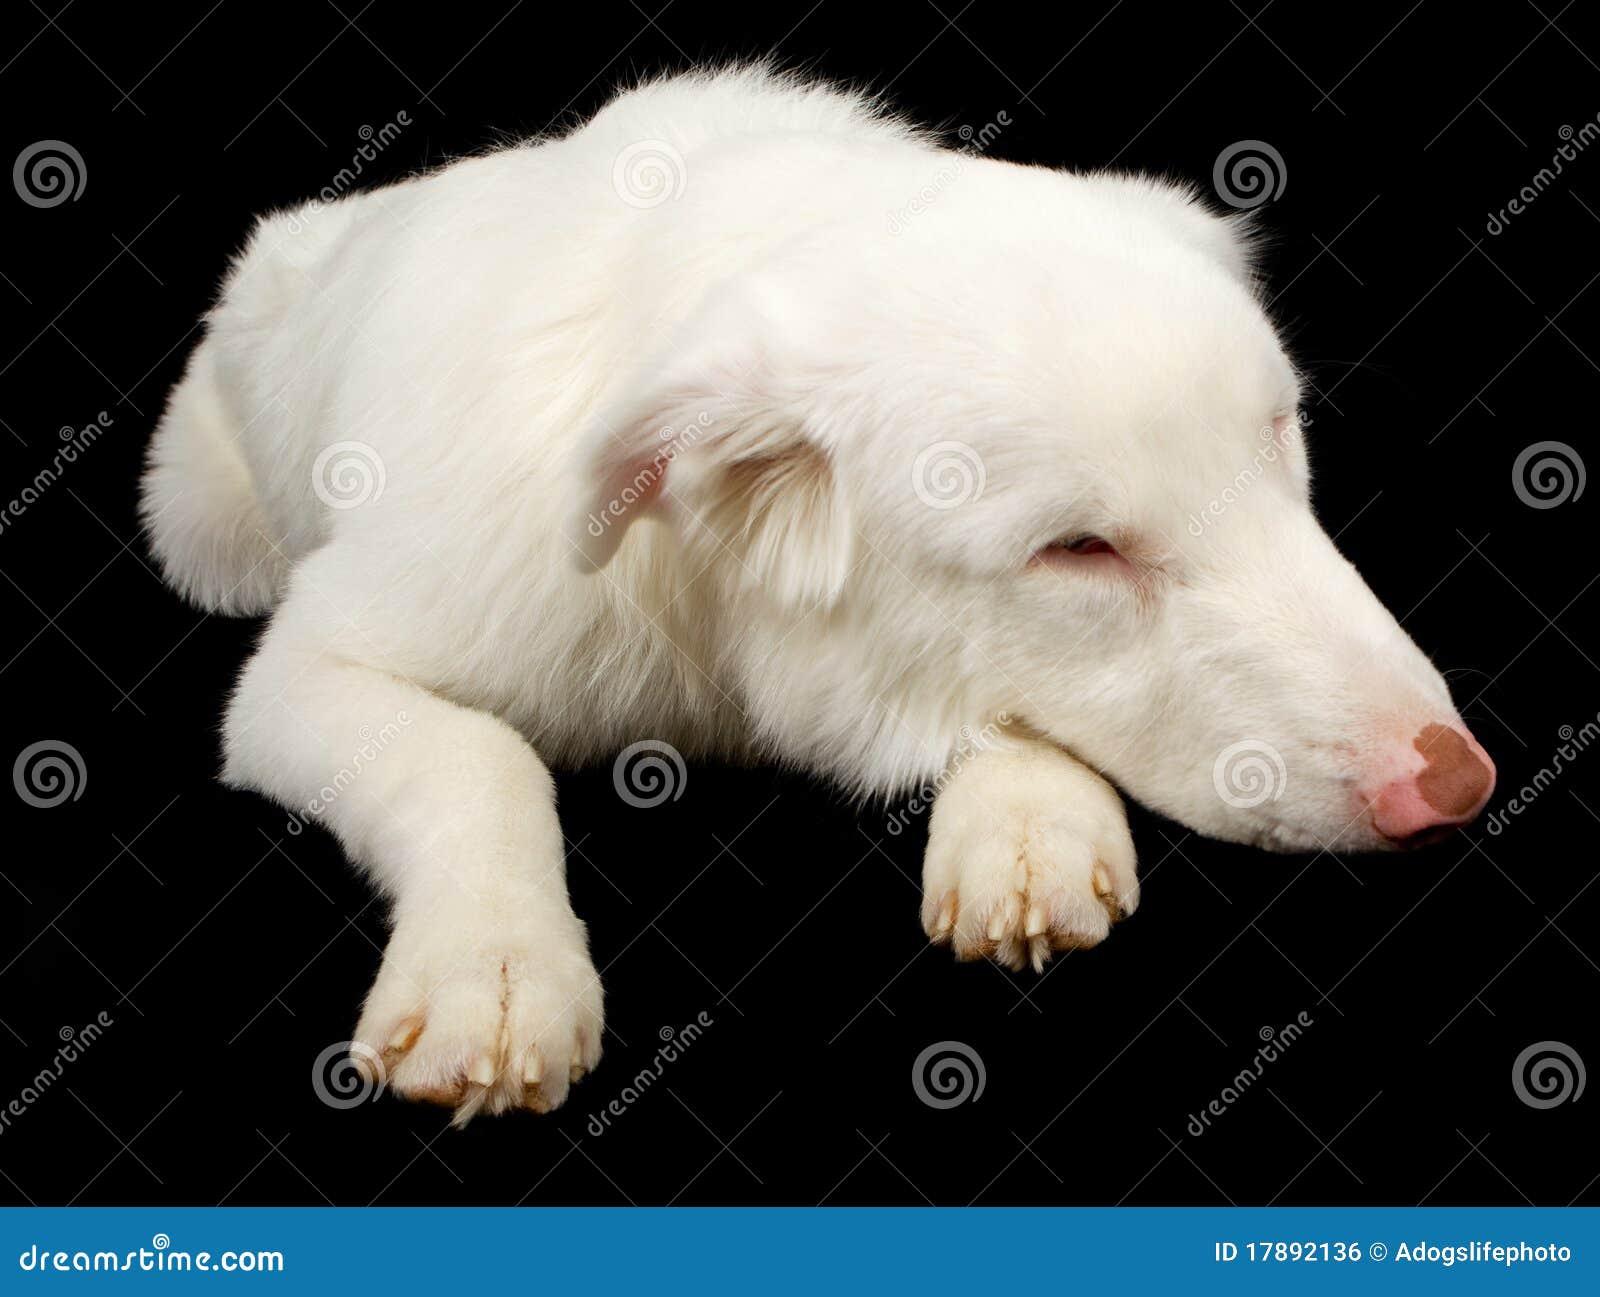 White Australian Shepherd Dog Looking Sad Royalty Free